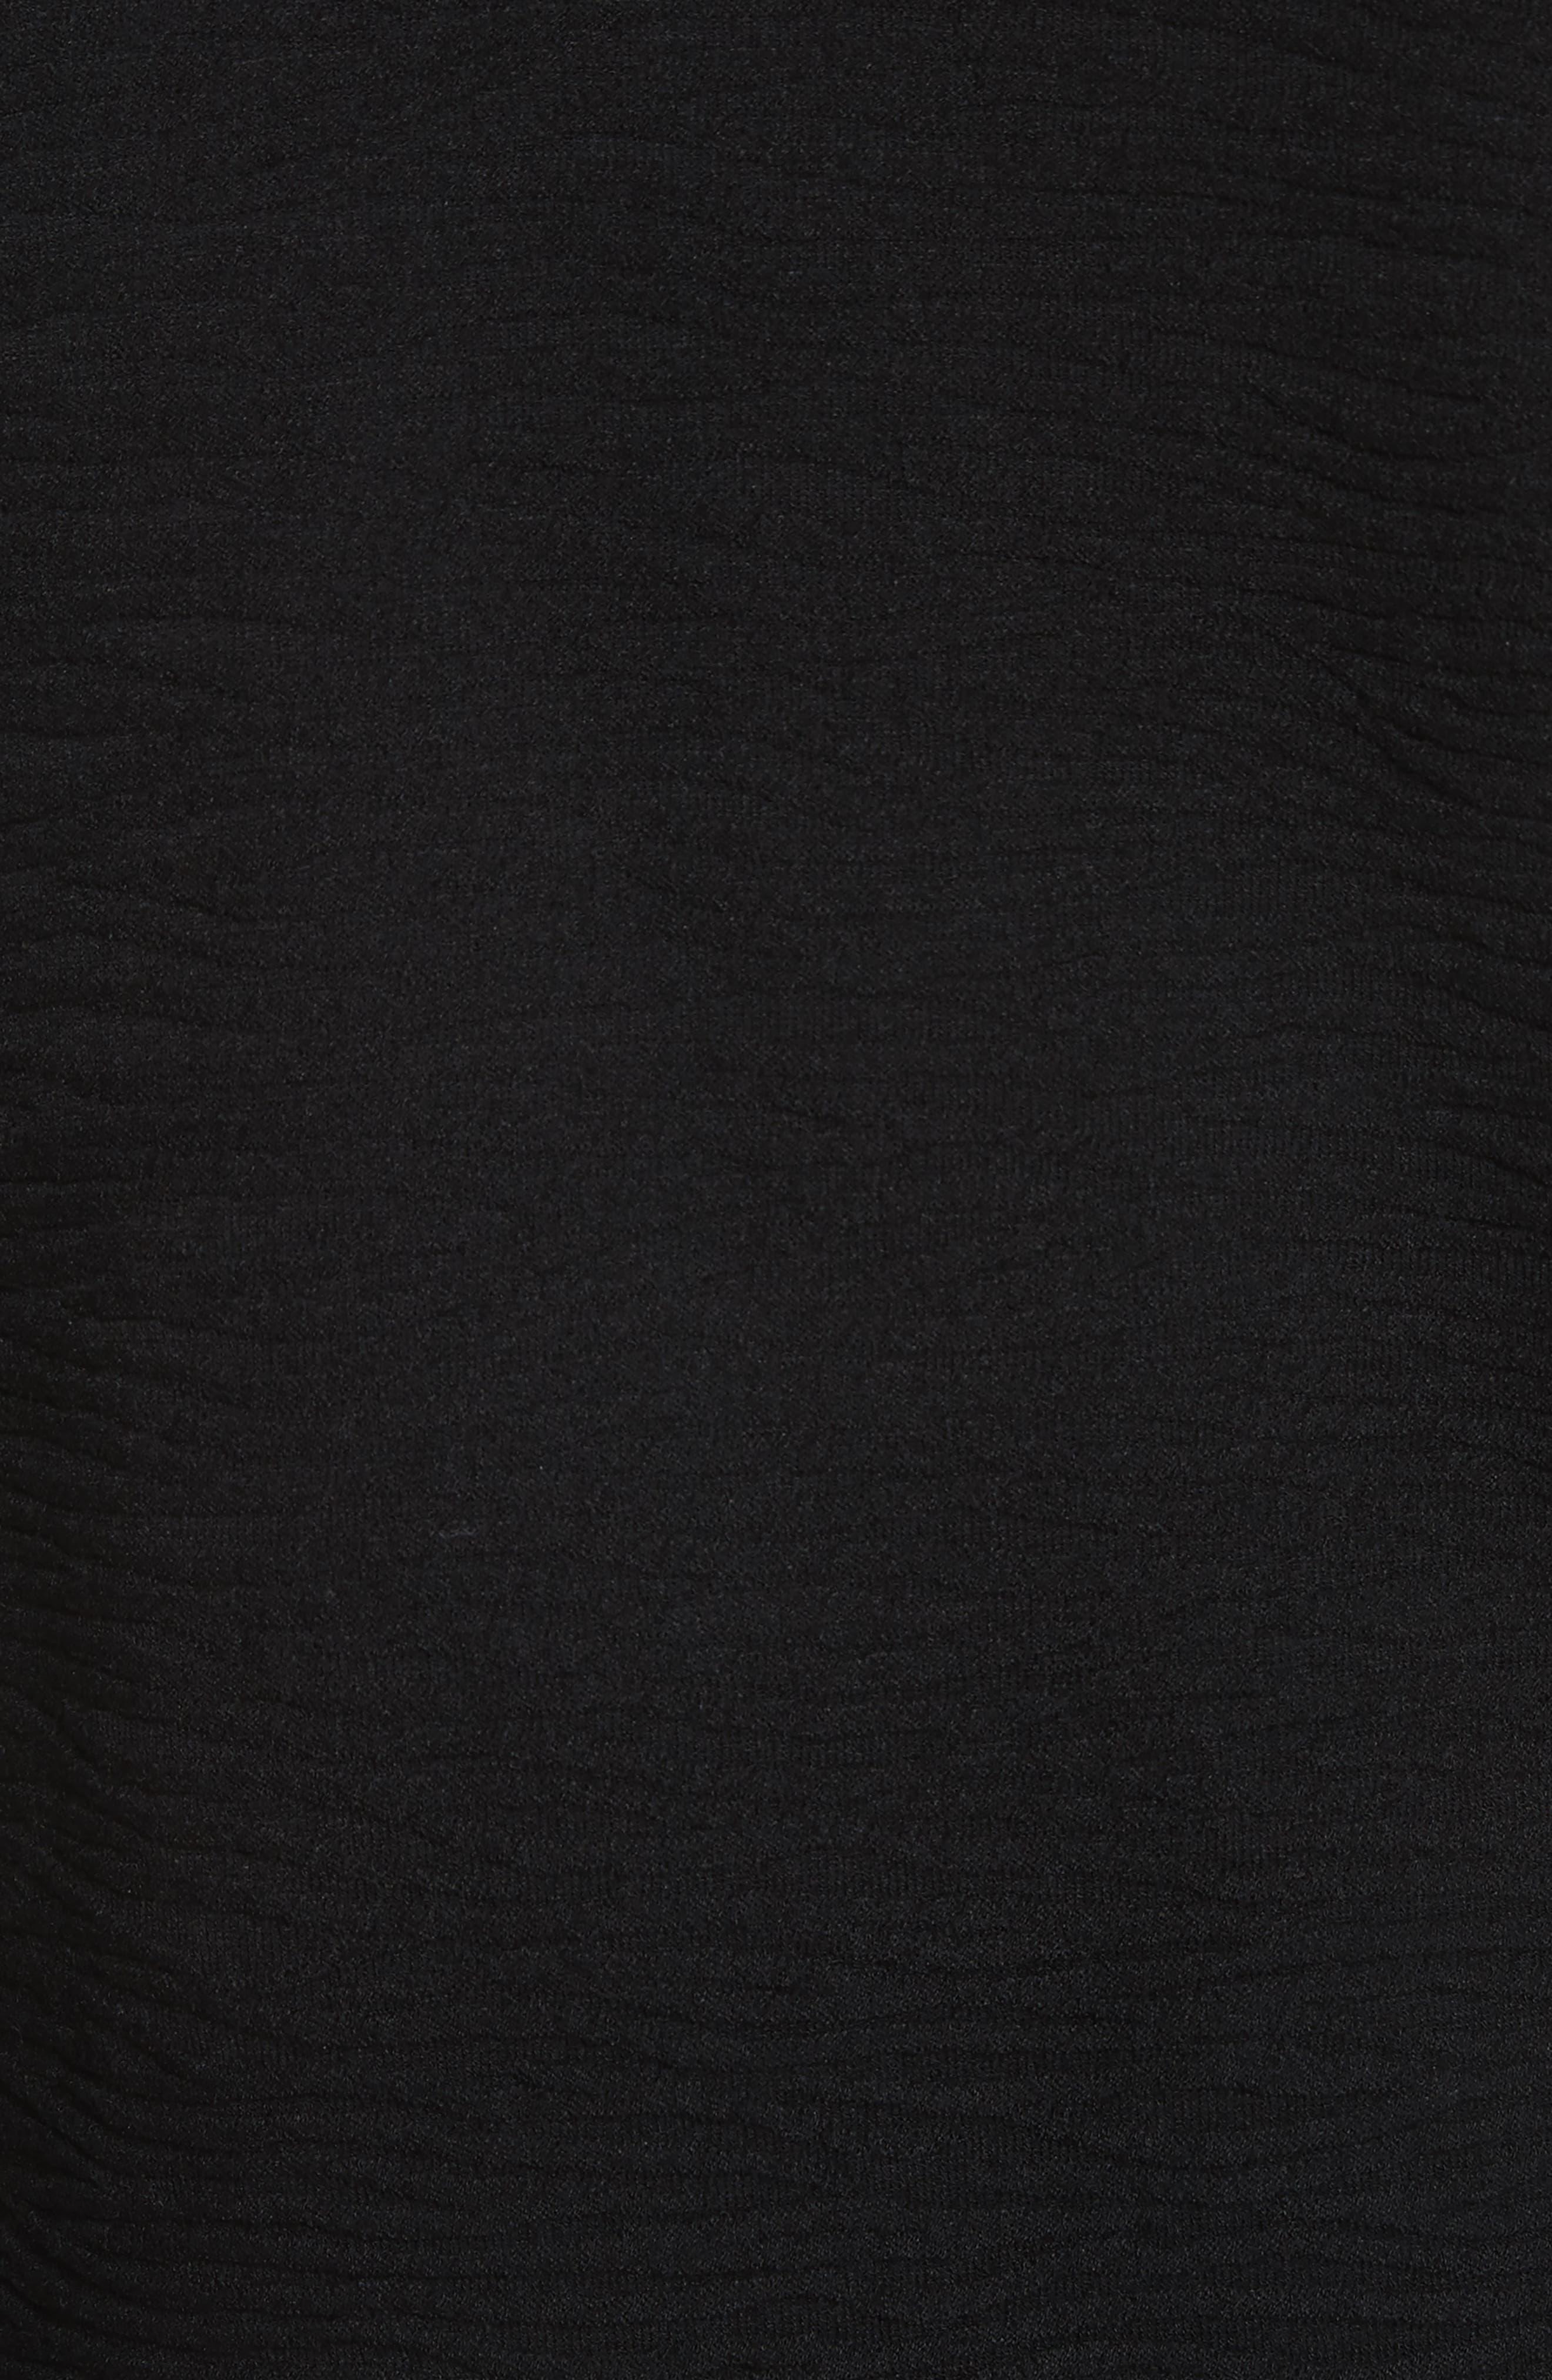 Slim Fit Allover Links Sweater,                             Alternate thumbnail 5, color,